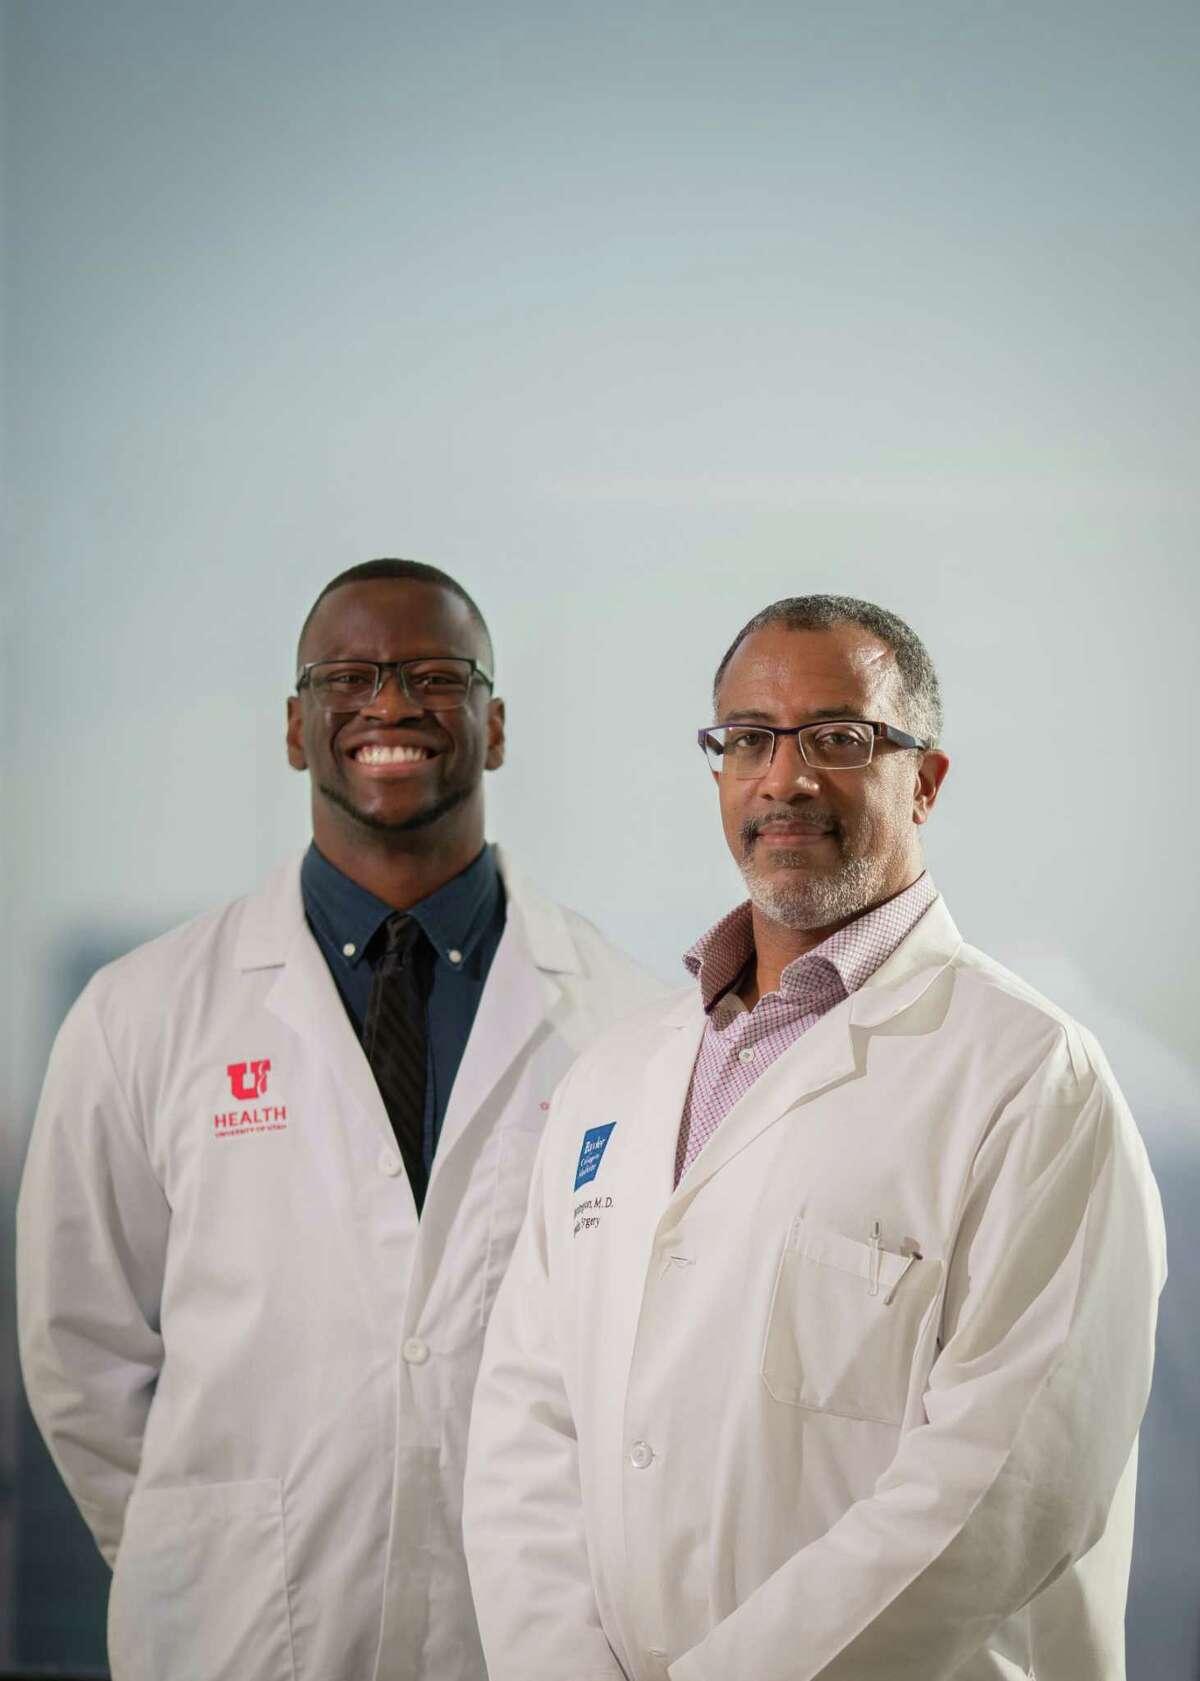 University of Utah school of medicine student and Nth Dimensions Orthopedic Summer Intern Olaoluwa Omotowa and Baylor Medicine orthopedics surgeon Melvyn Harrington at the Baylor College of Medicine, Friday, July 16, 2021, in Houston.